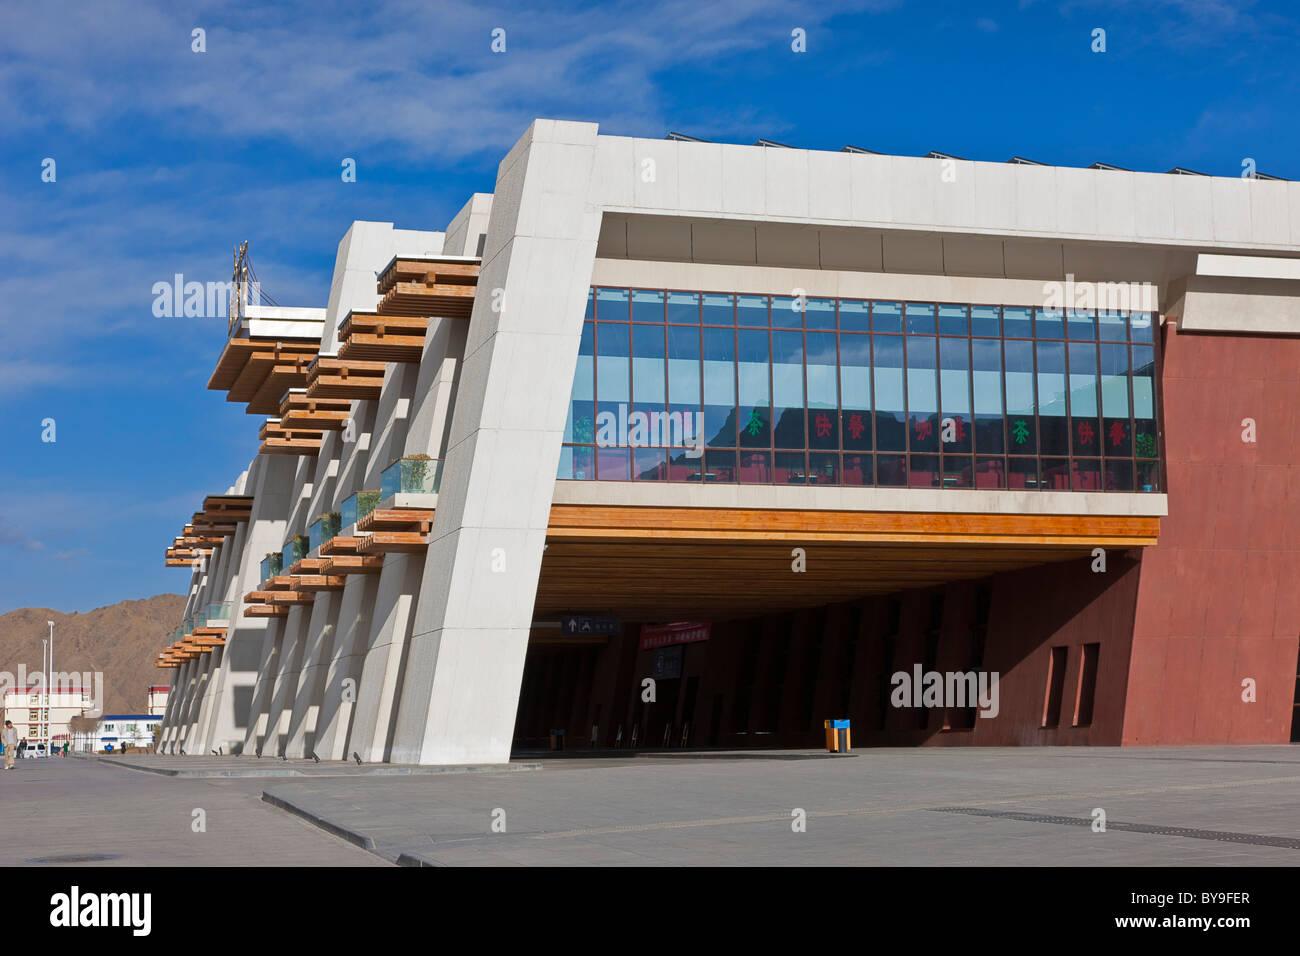 Exterior of the railway station Lhasa Tibet. JMH4624 - Stock Image